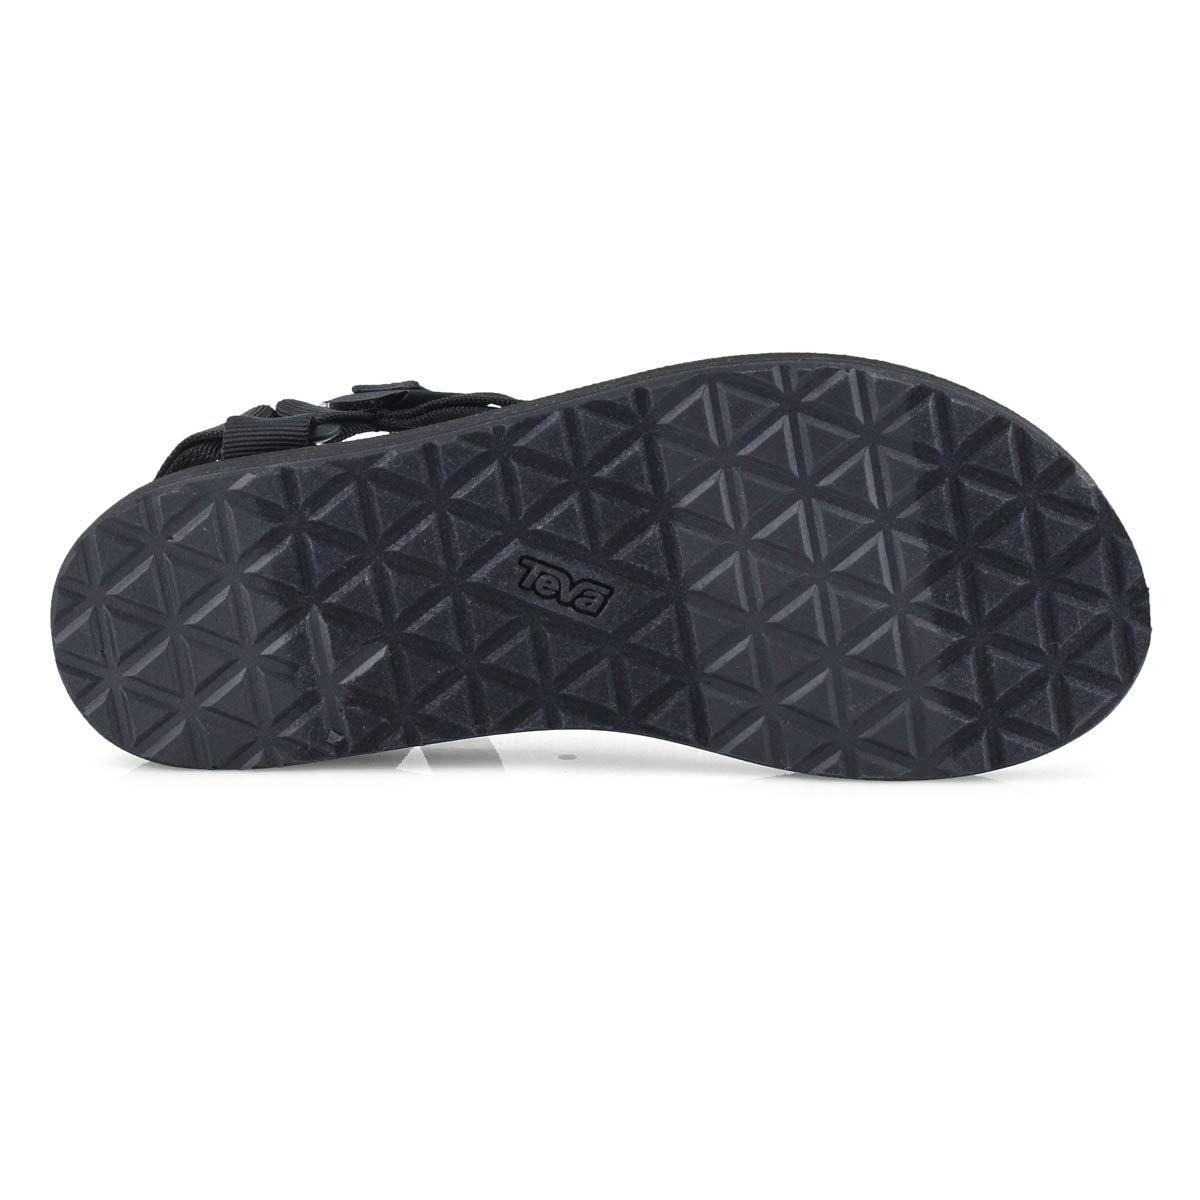 Lds Orig Universal black sport sandal